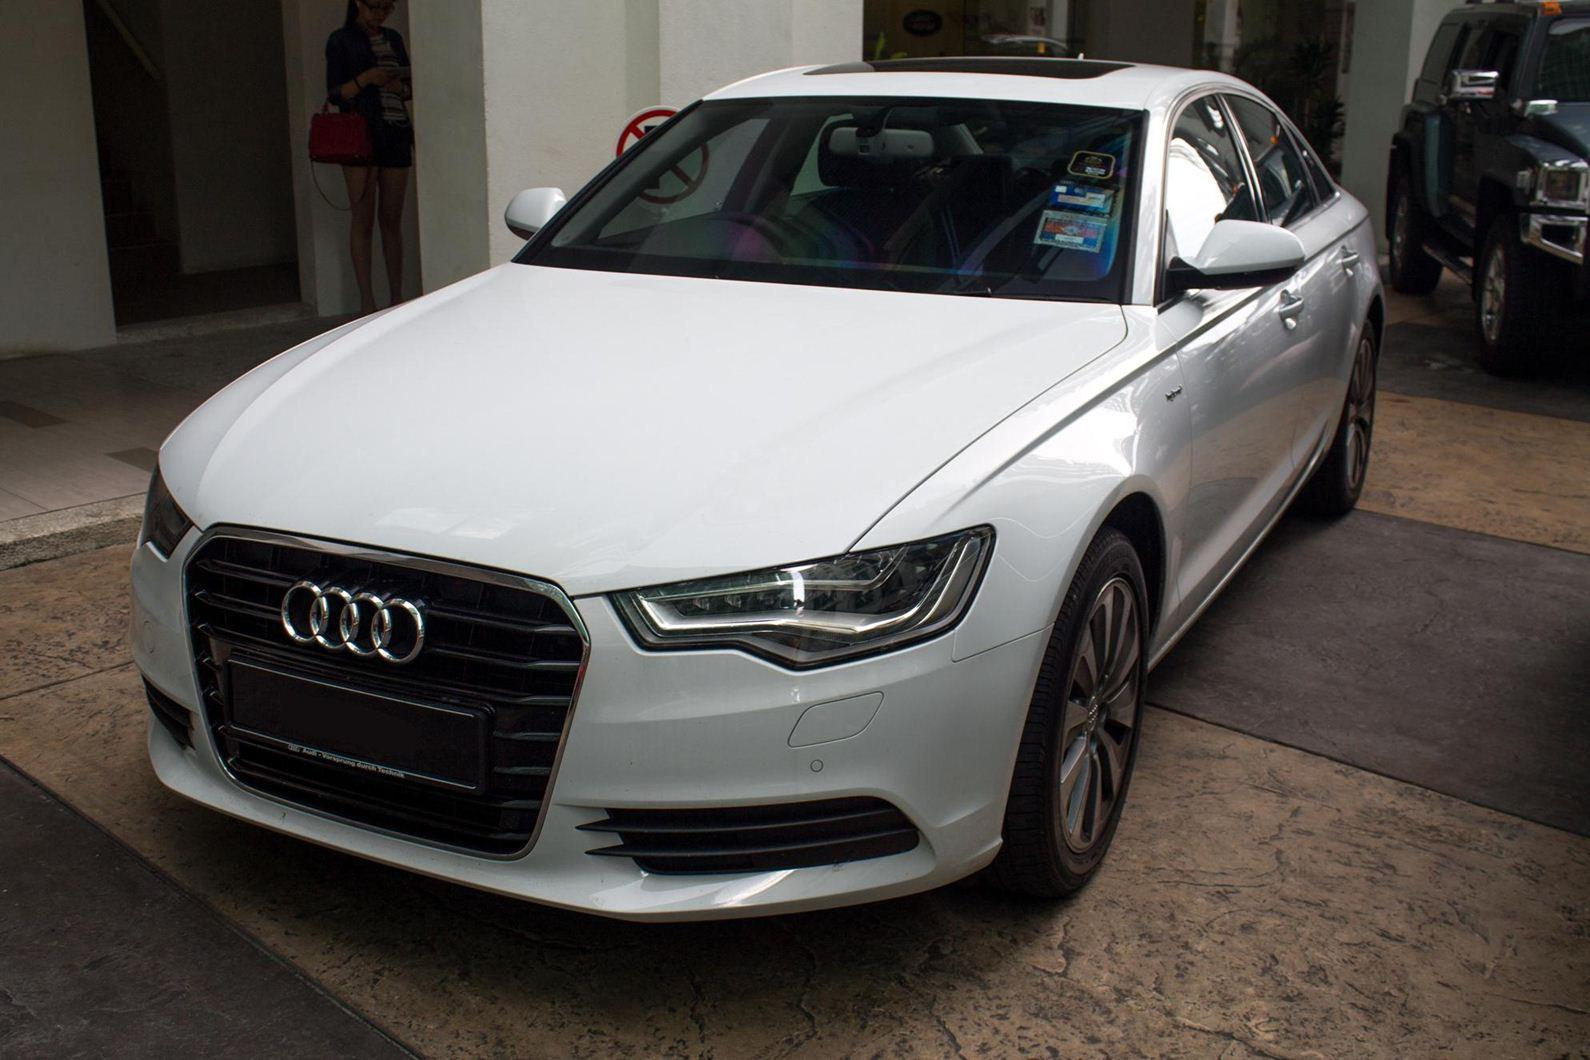 Audi A Car Rental Malaysia Affordable Luxury Vehicle - Audi car rental